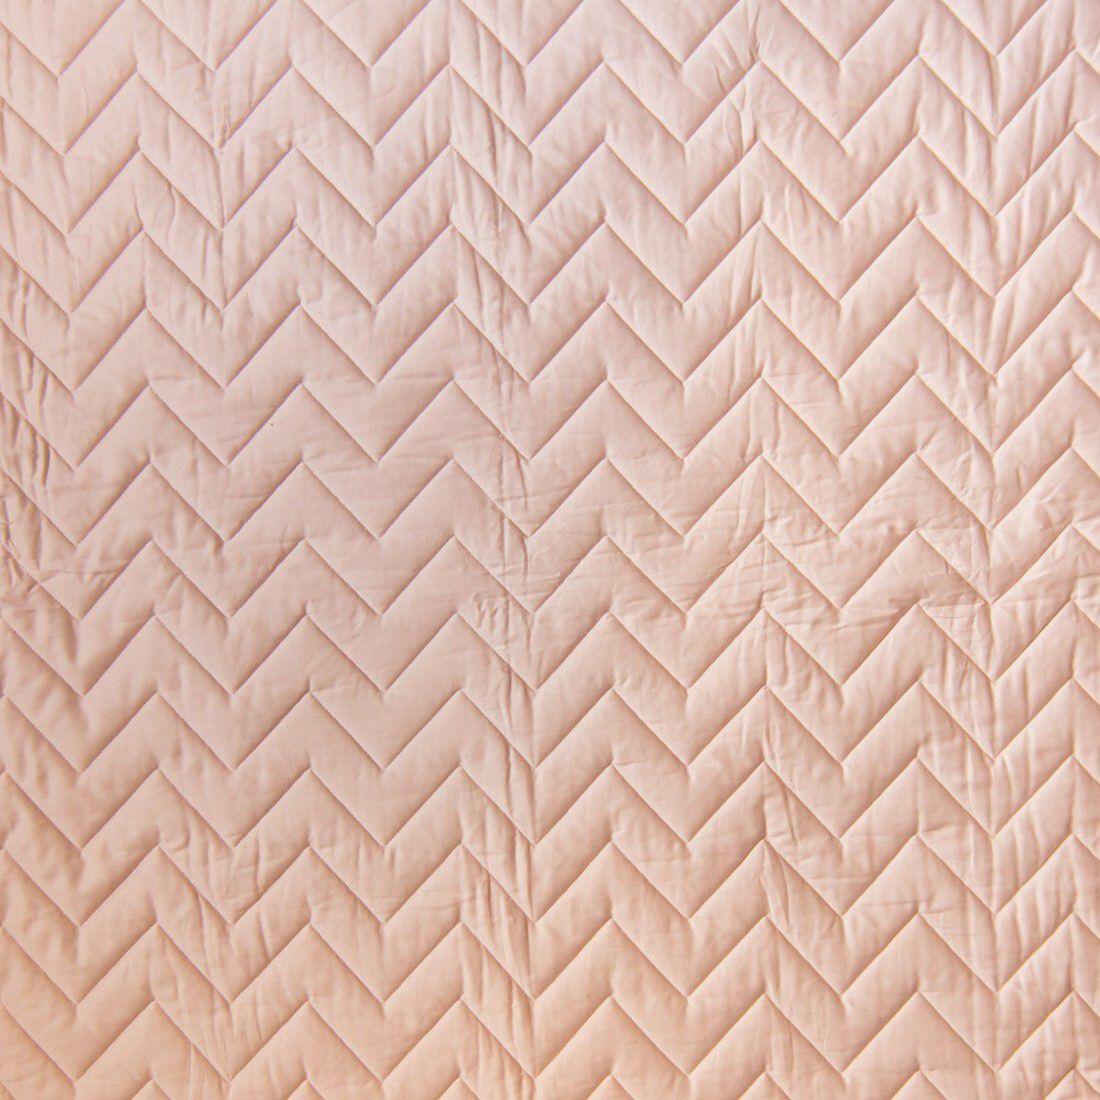 Colcha Com Elástico Percal 300 Fios Acetinado Chevron Rosa Nude